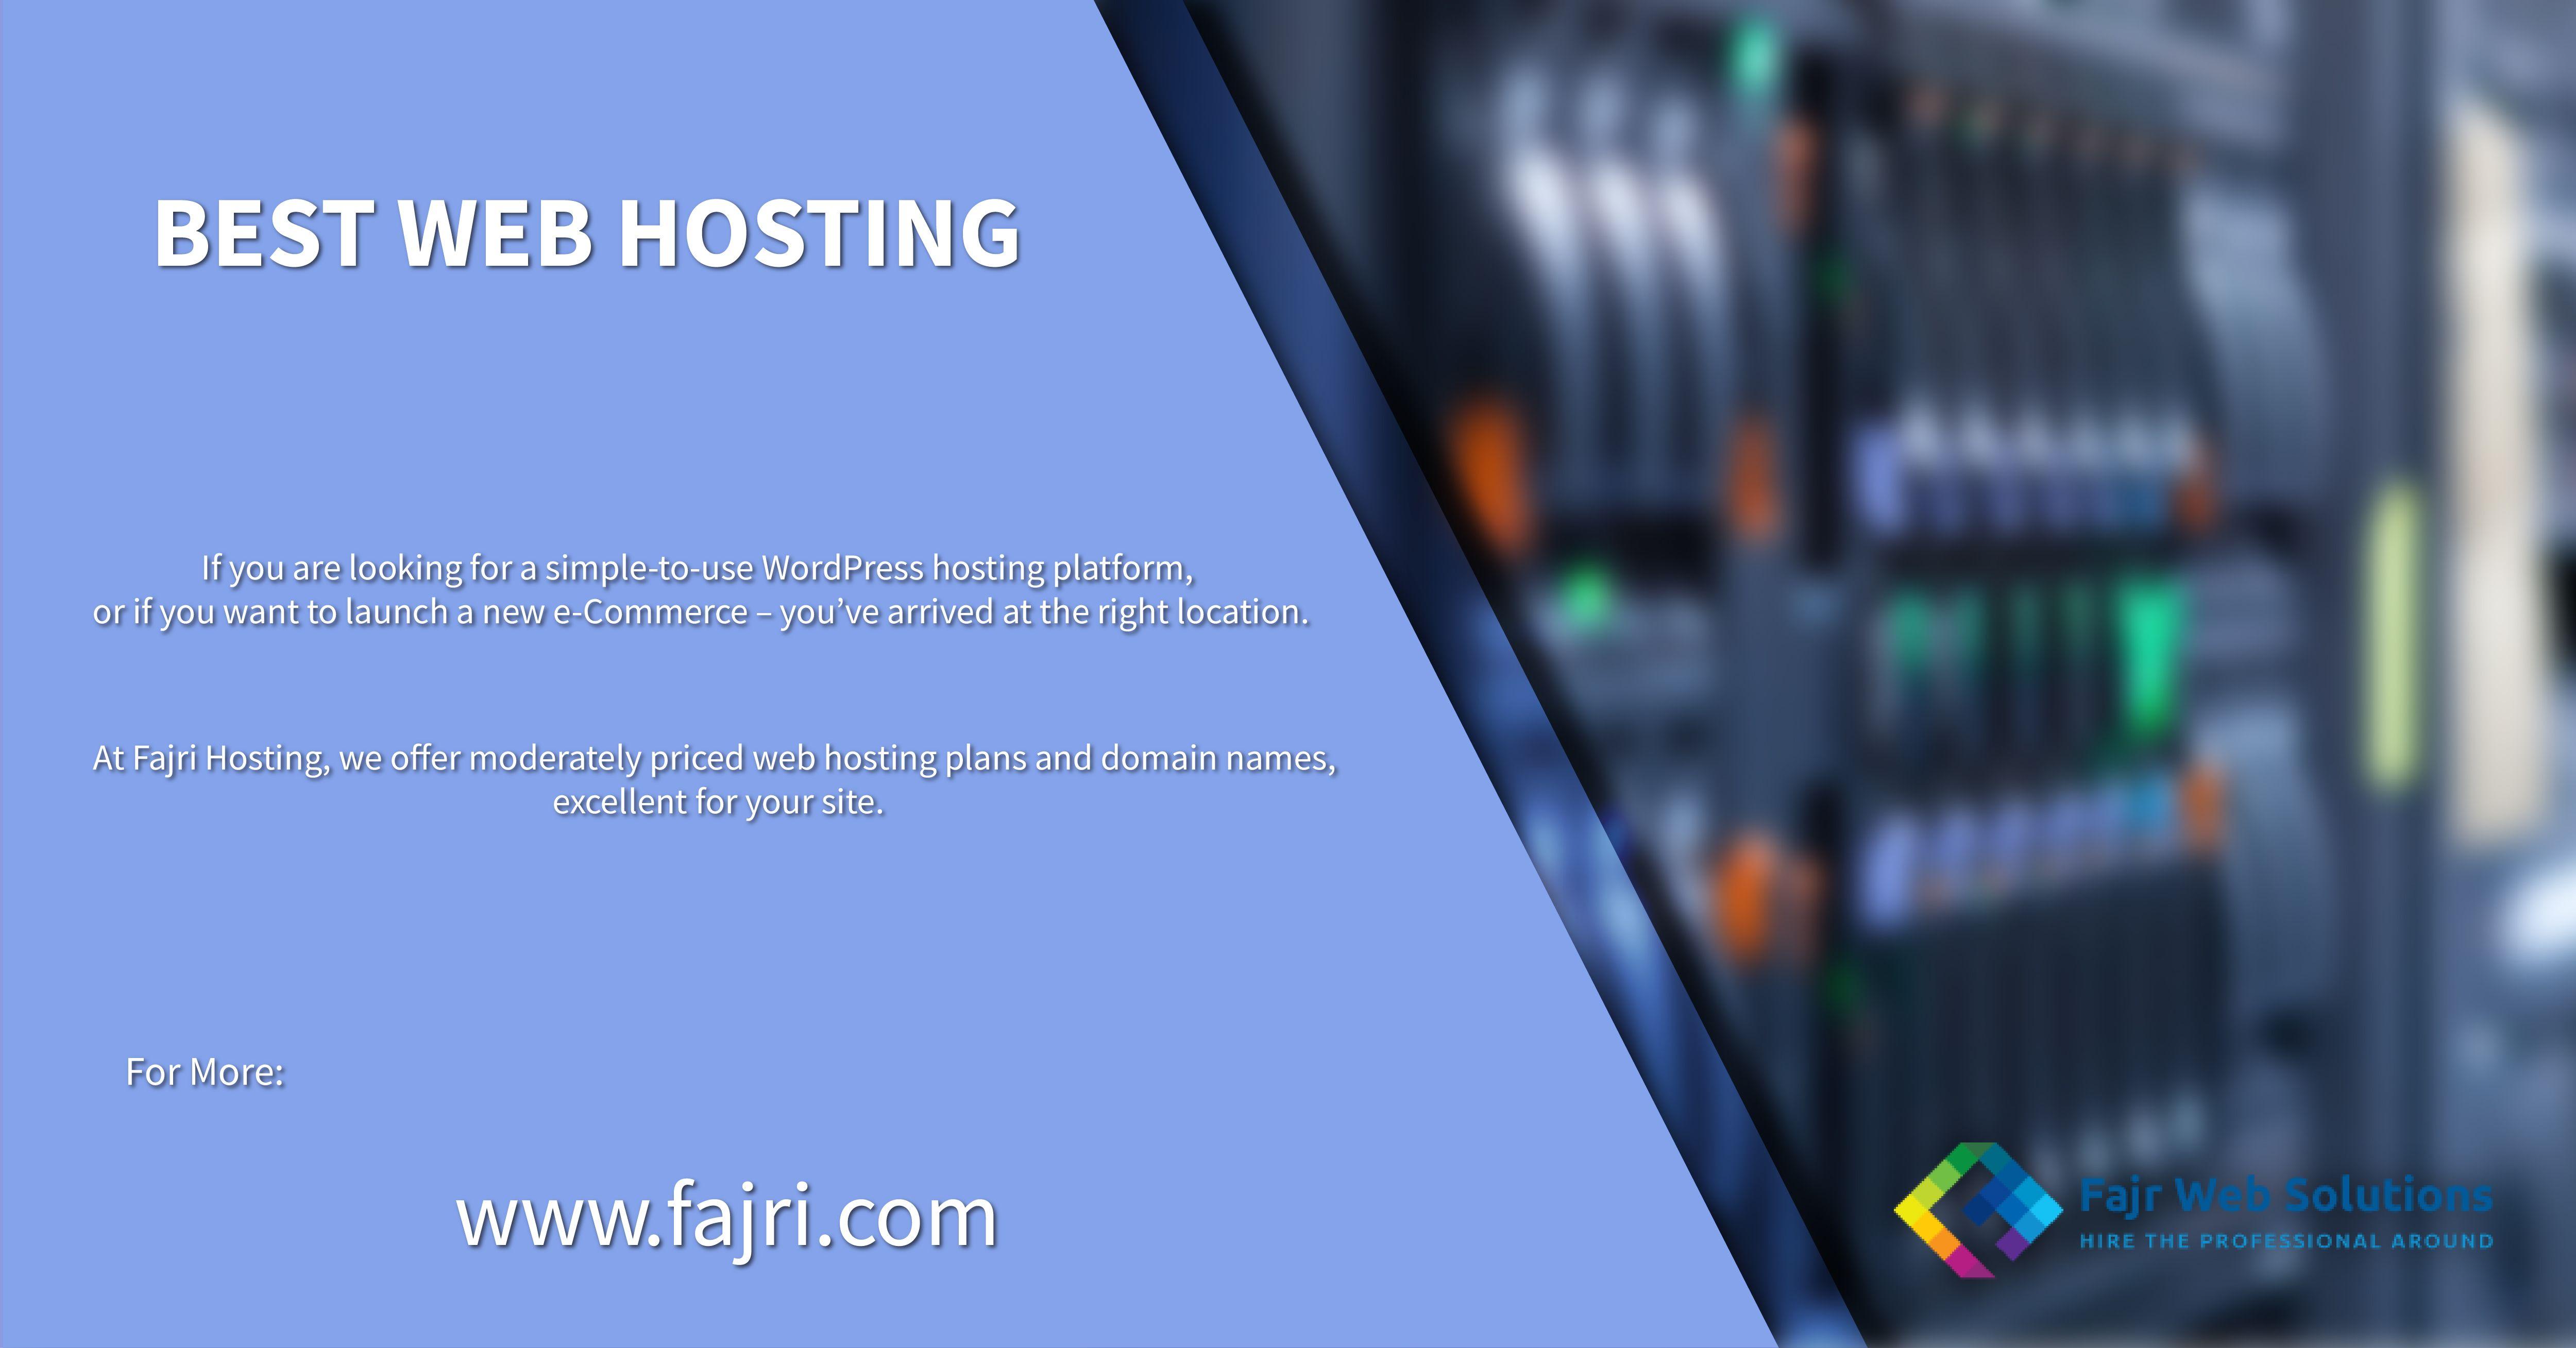 Cheap Web Hosting In Dubai Web Hosting Web Design Company Top Web Designs